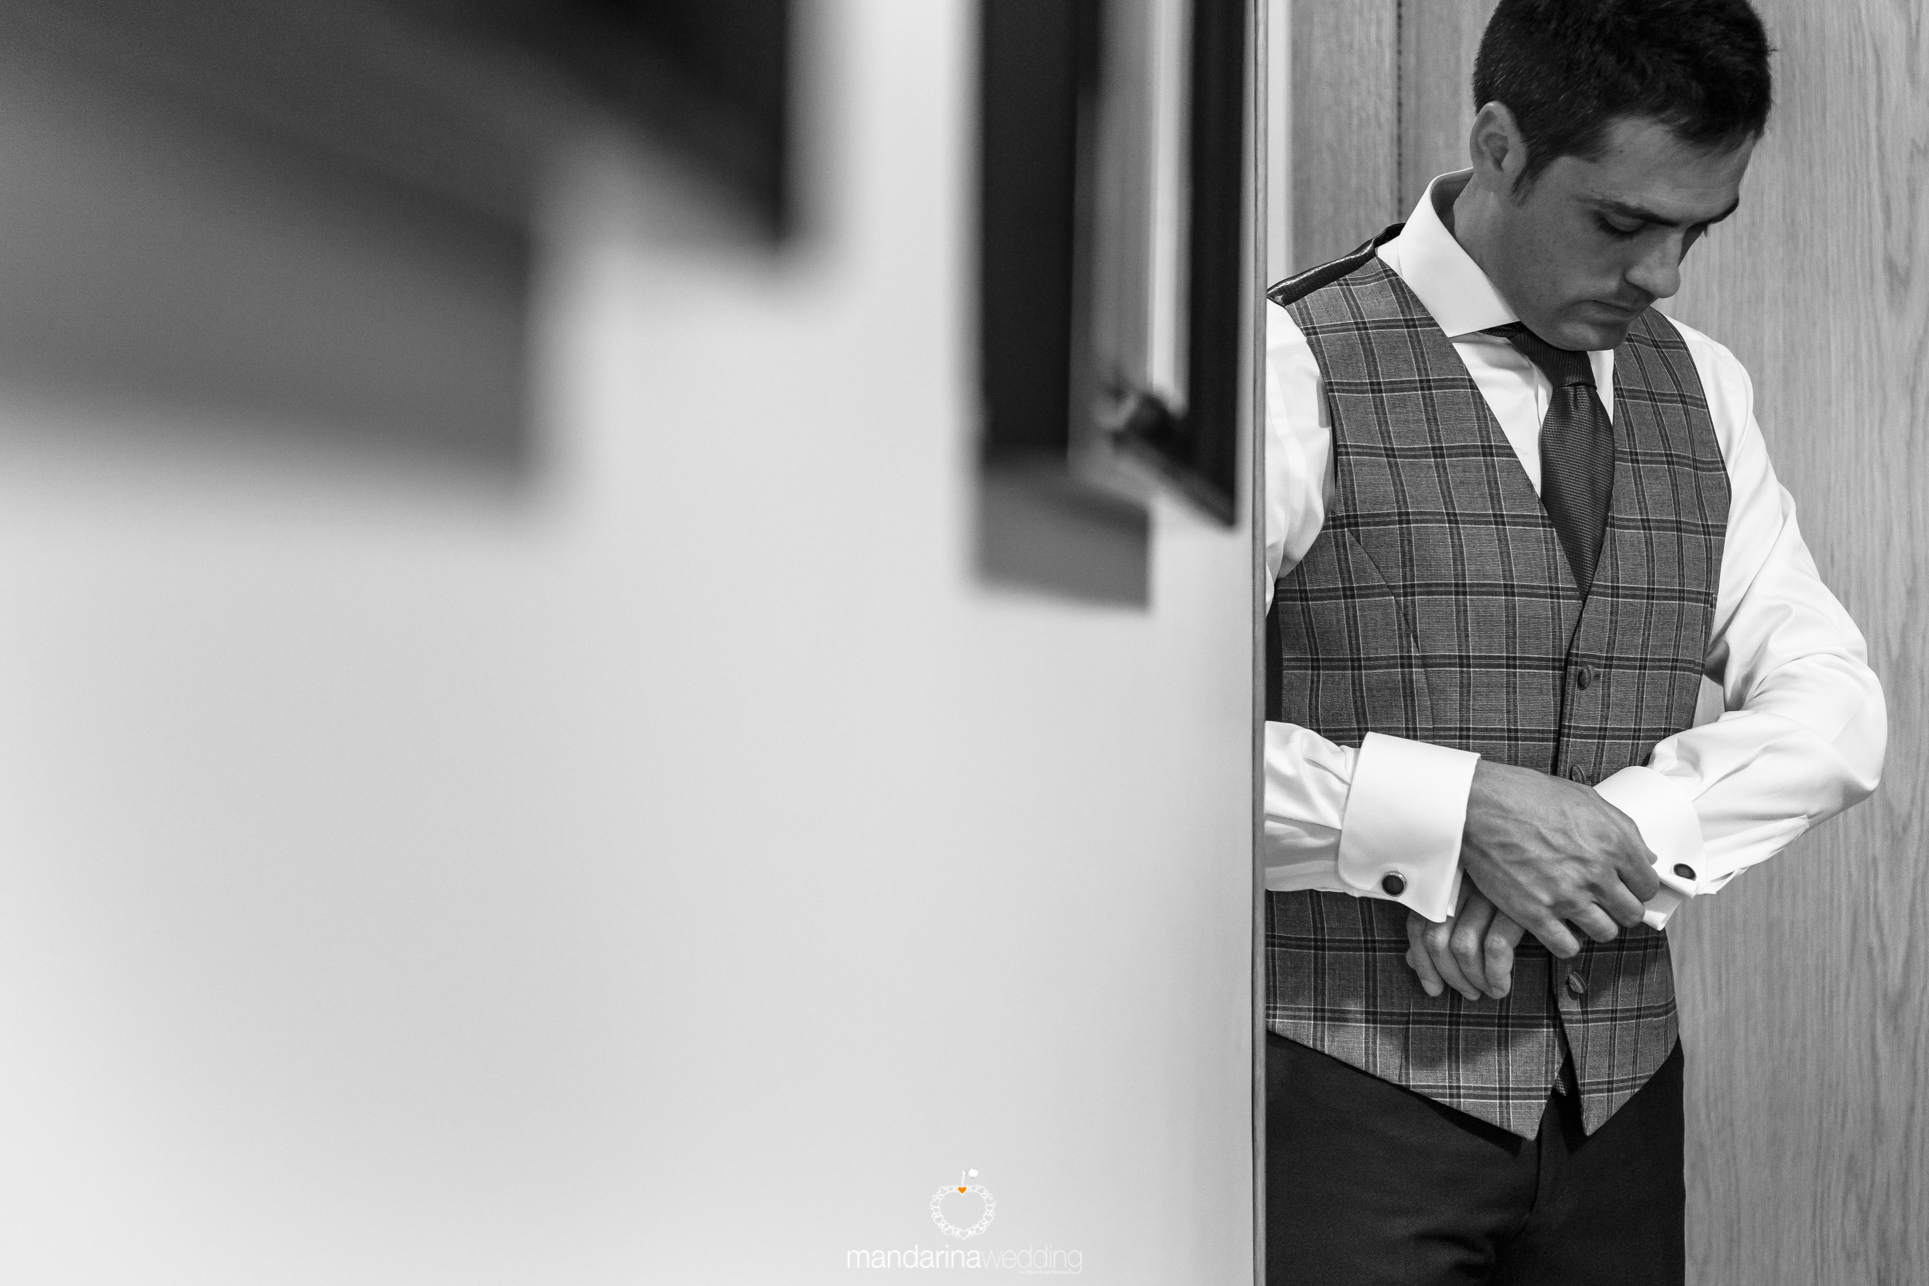 mandarina wedding, fotografo boda pais vasco, fotografo boda zaragoza, fotógrafo boda soria, fotografo boda Madrid, fotógrafo boda tarragona-19